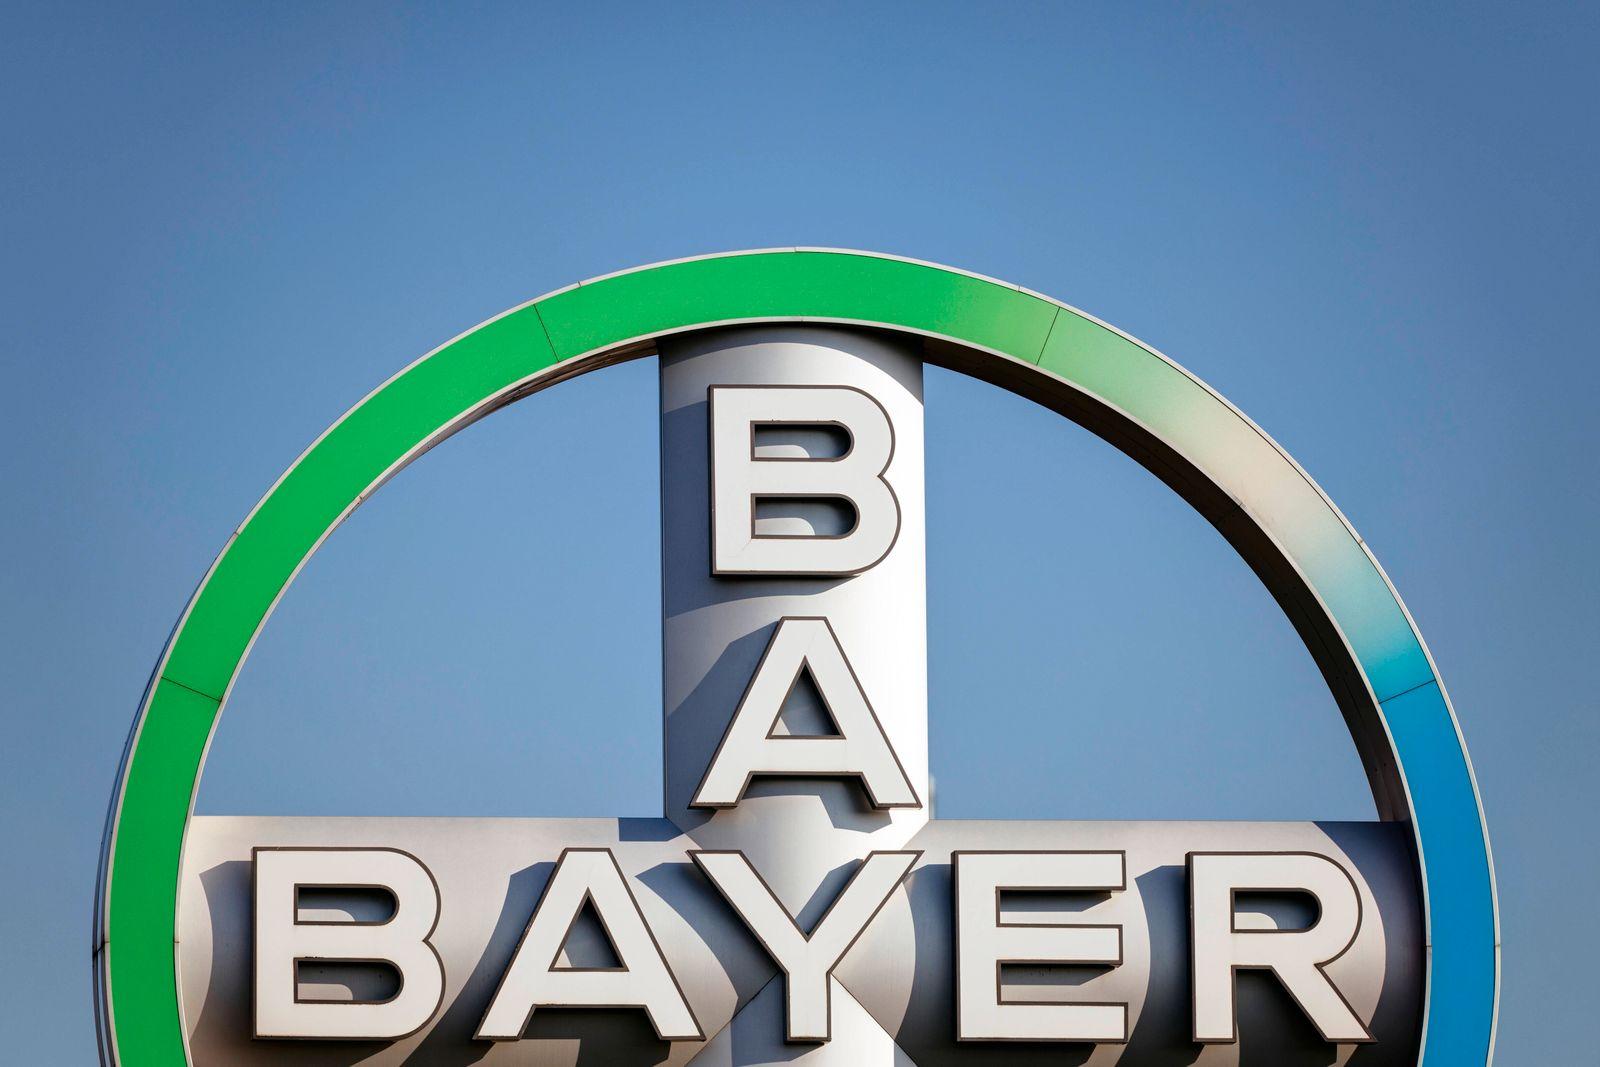 Logo des Bayer-Konzerns am Flughafen Köln/Bonn. Köln, 21.04.2020 *** Bayer Group logo at Cologne Bonn Airport Cologne,